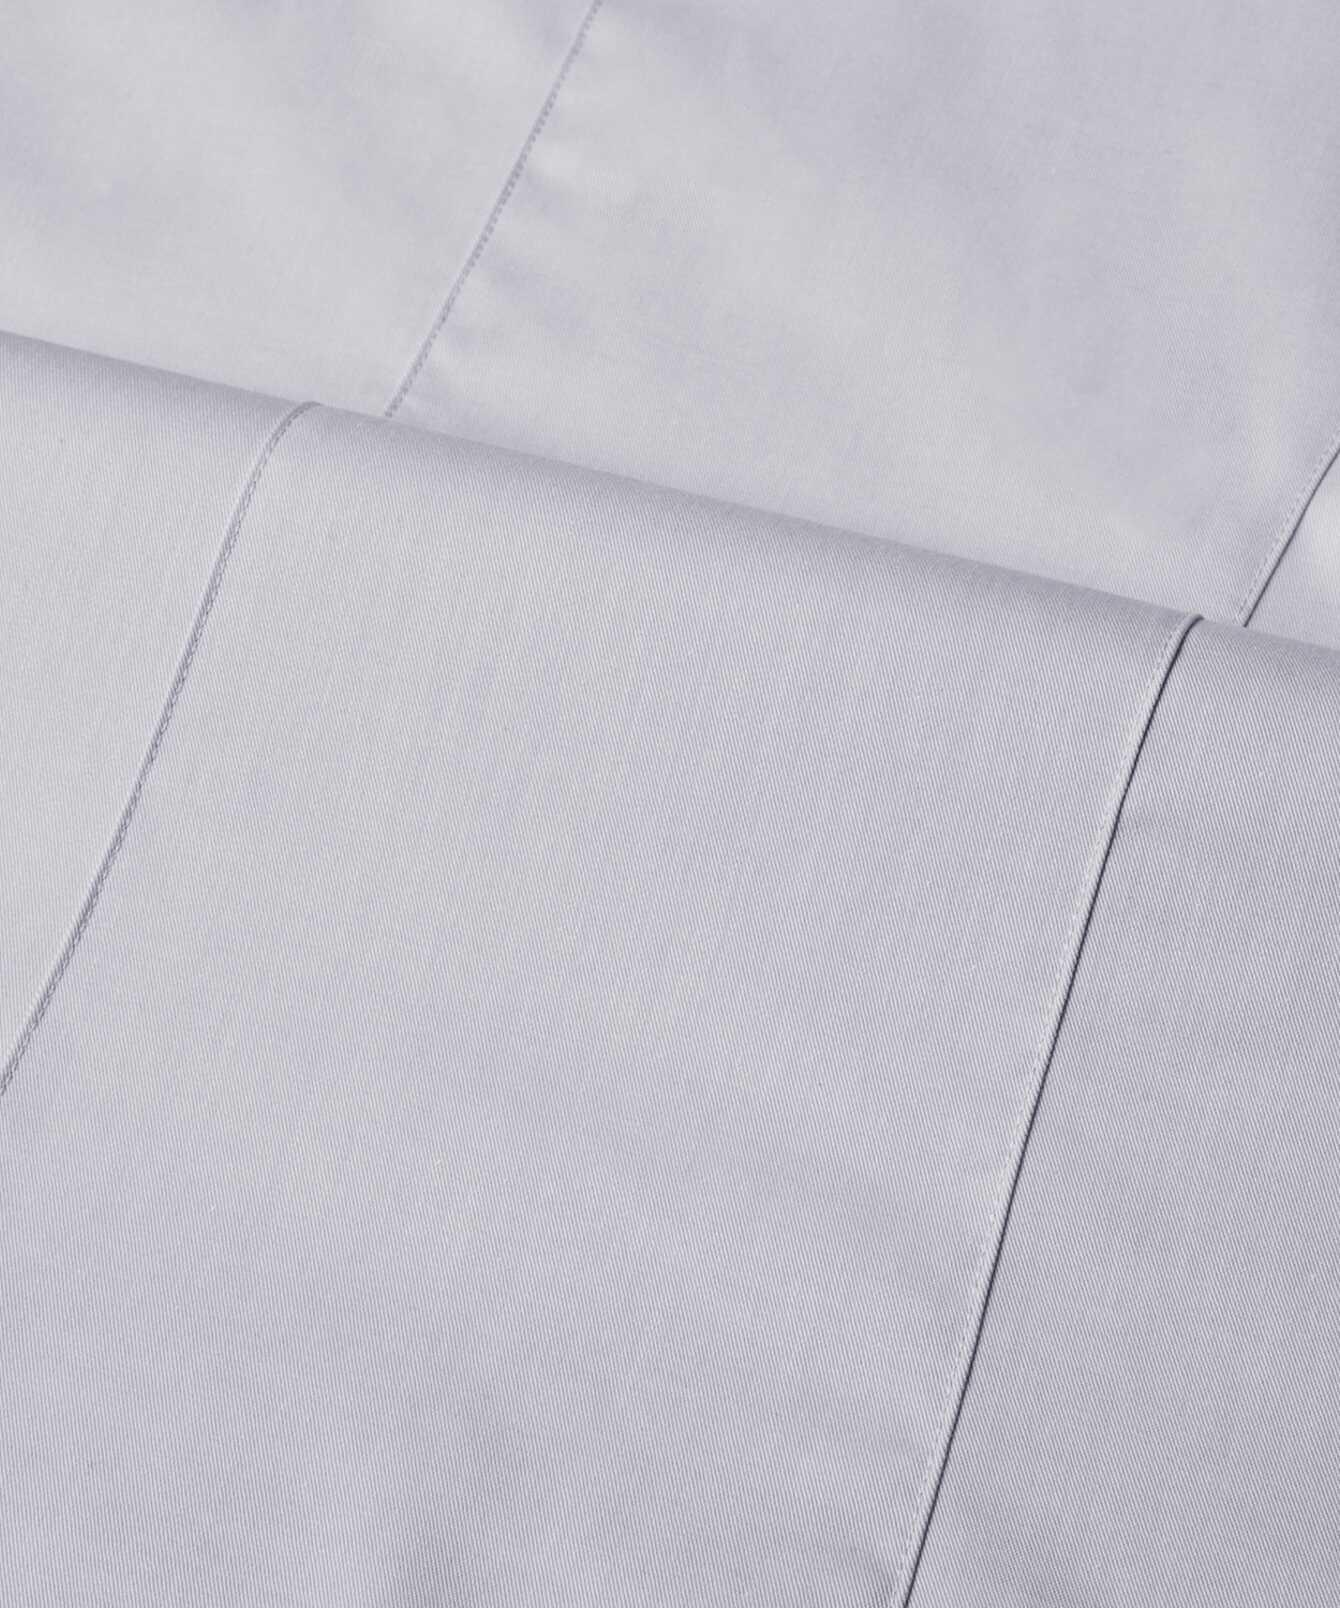 Shirt Moa Grand Twill Light Grey  The Shirt Factory